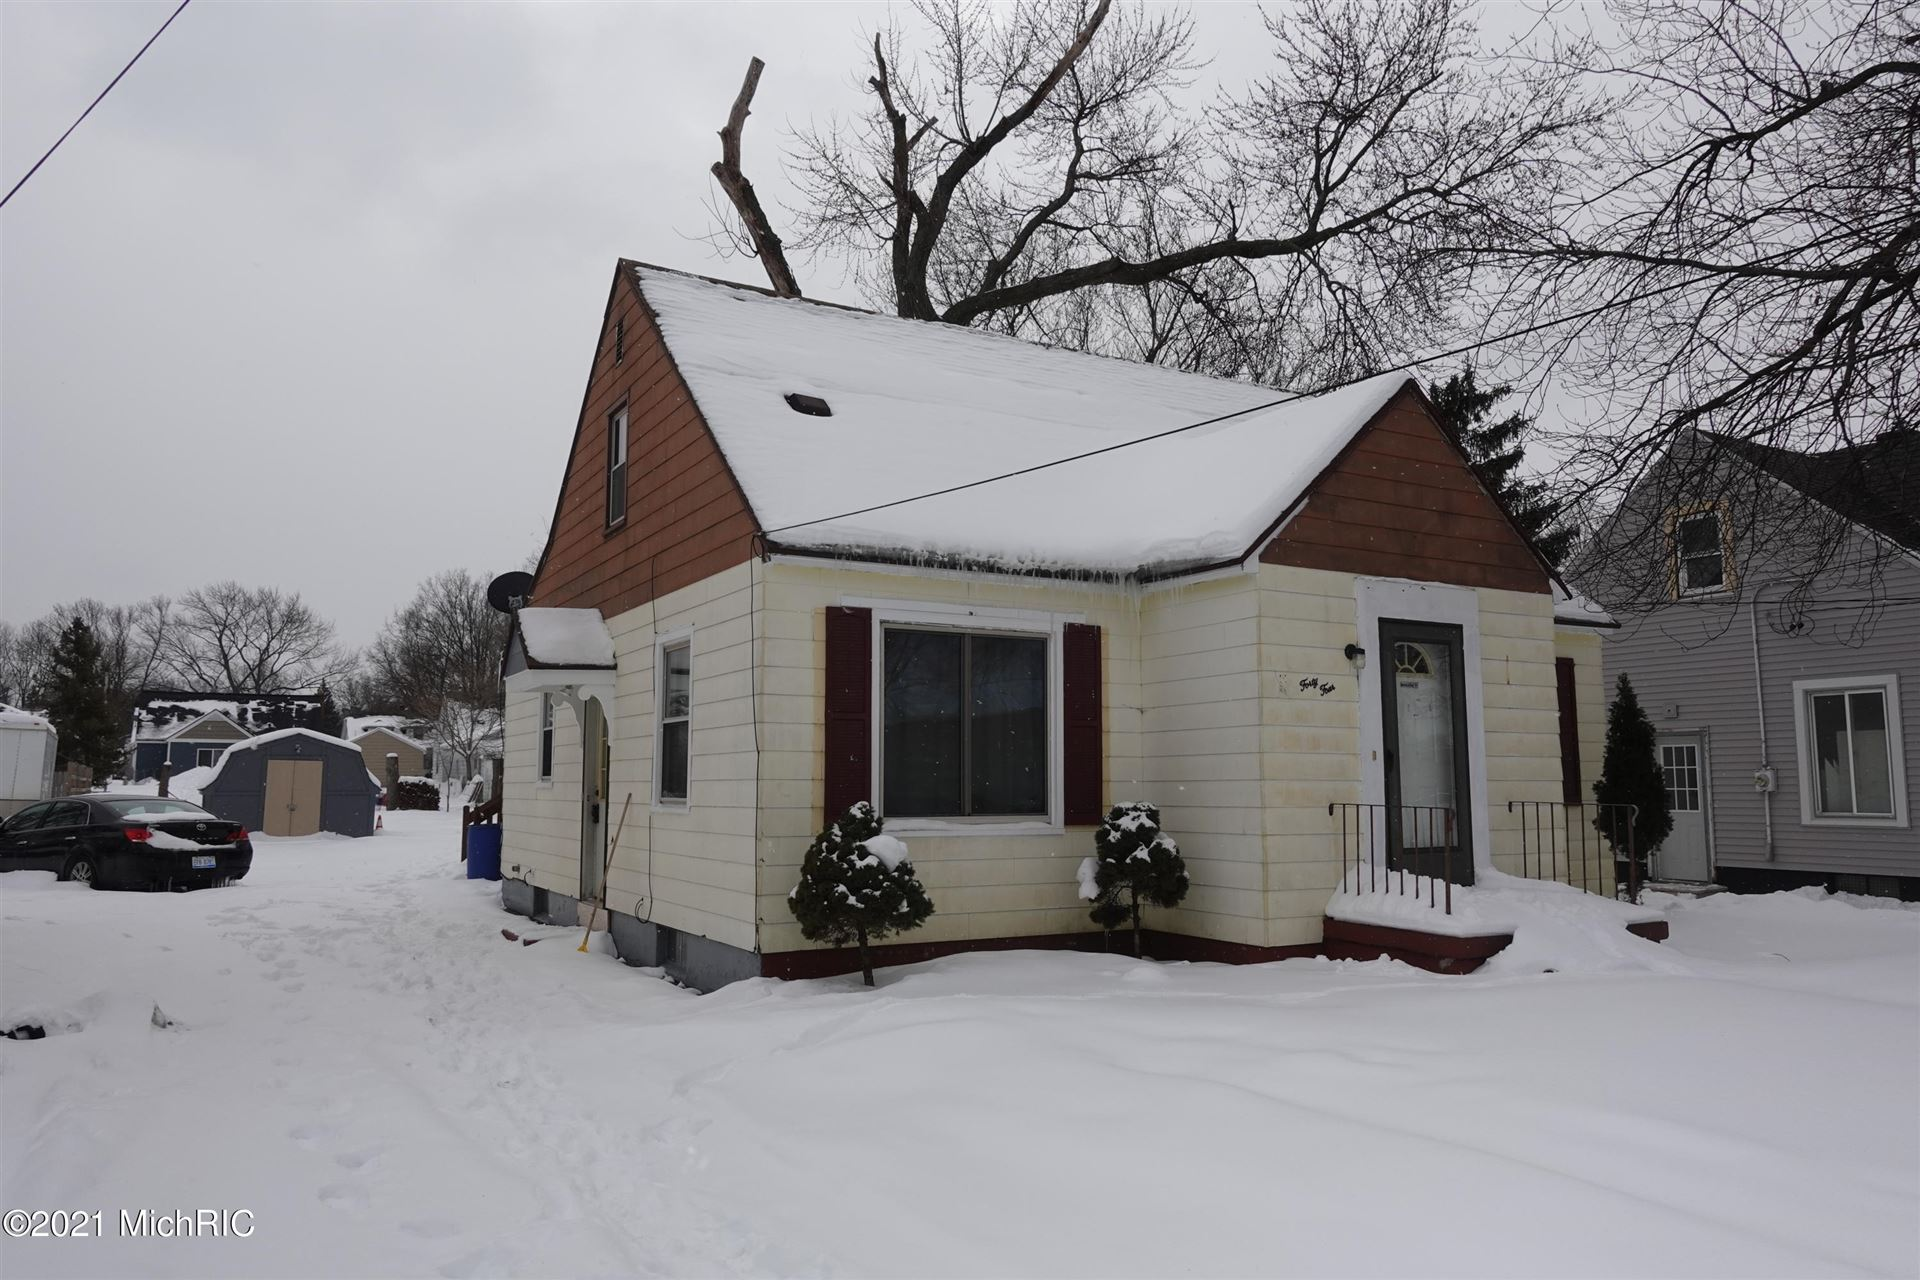 44 Colrain Street SE, Wyoming, MI 49548 - MLS#: 21005015